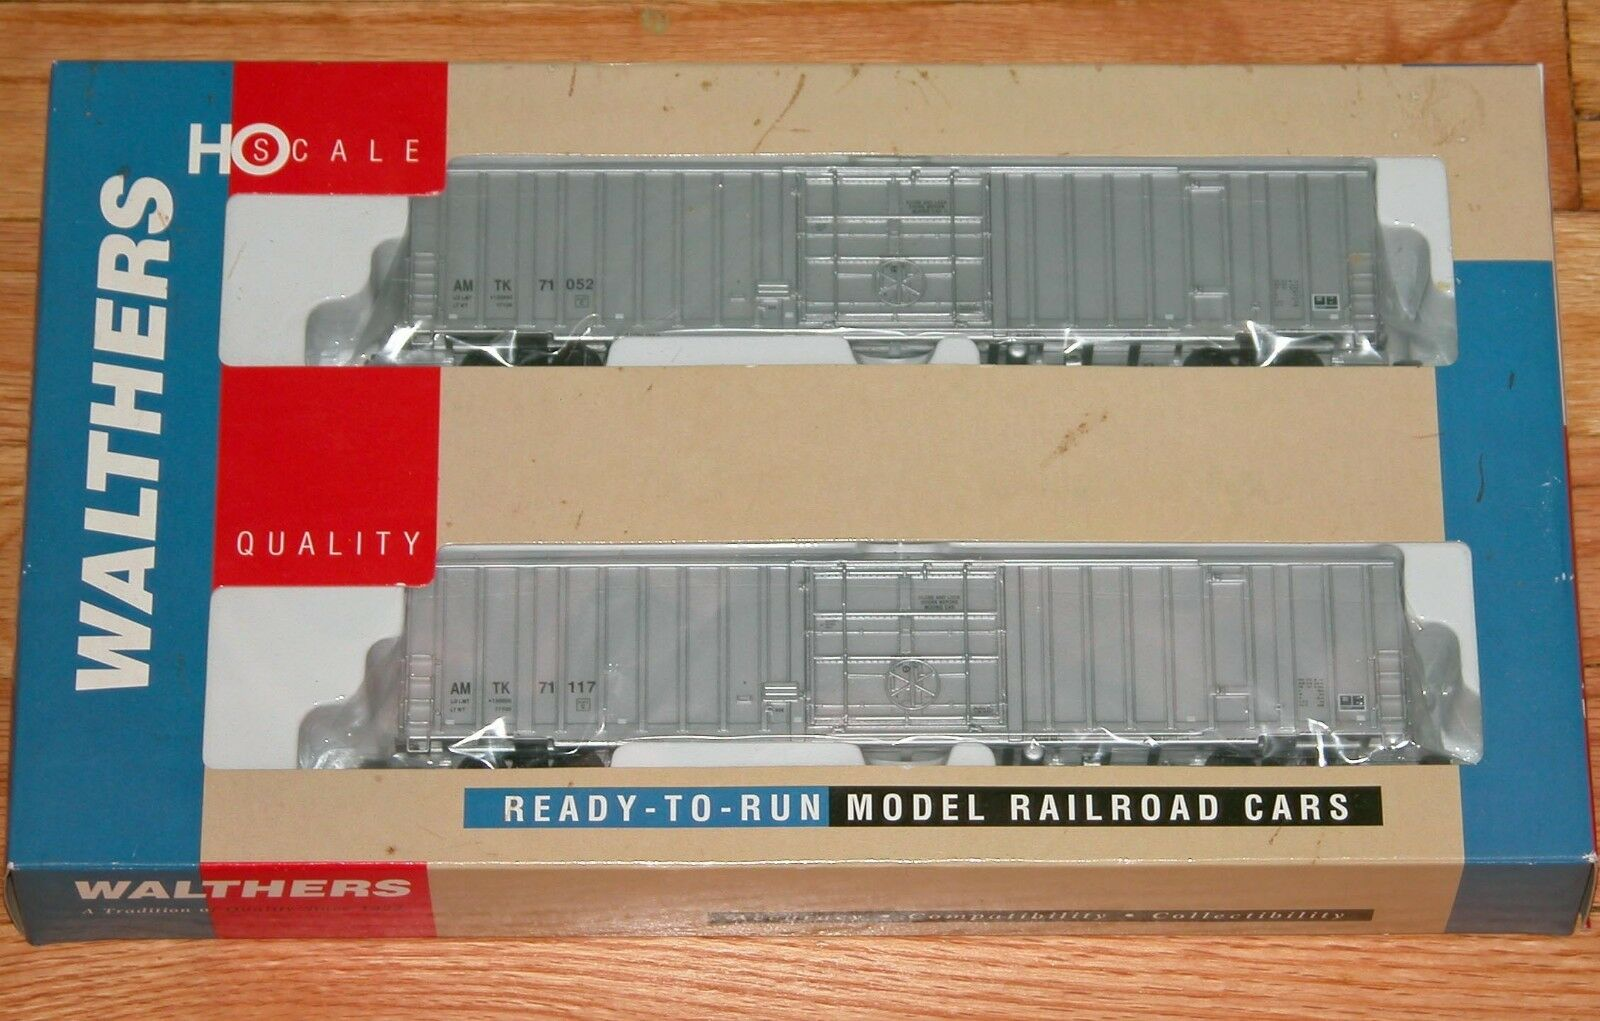 Walthers 932-26042 60' EXPRESS Furgón Amtrak Plateado   71052, 71117